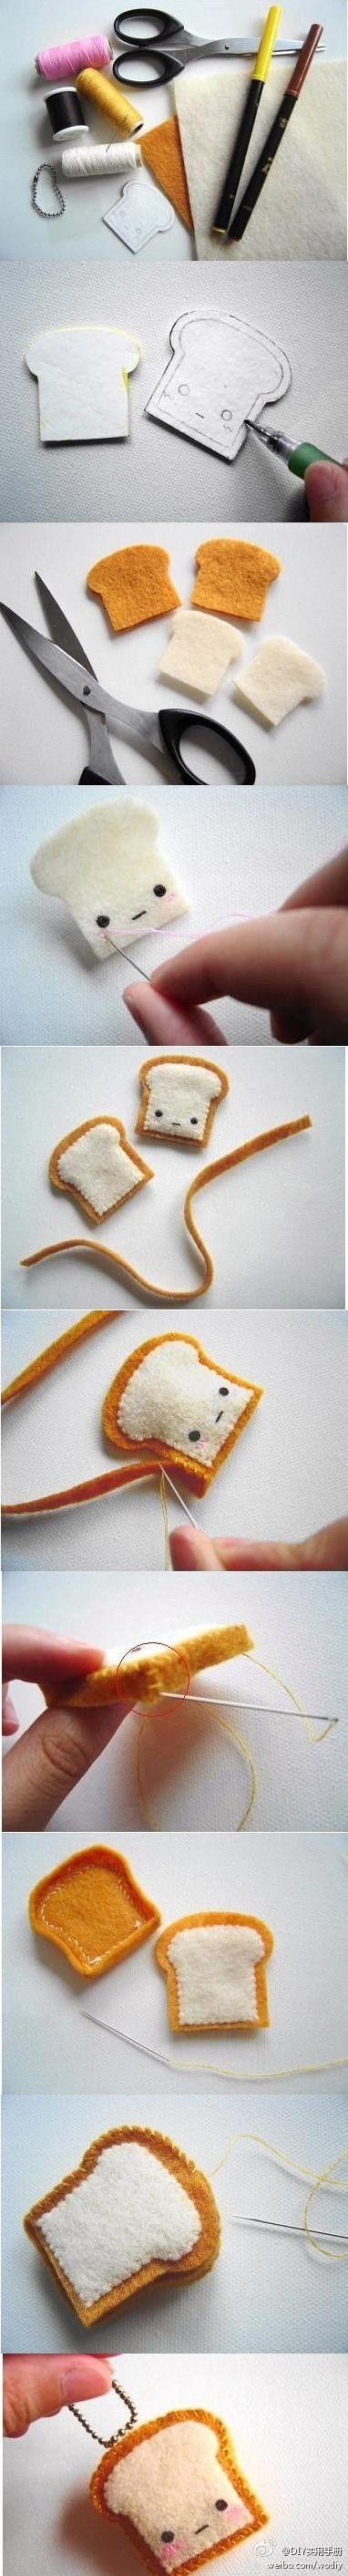 felt slice of bread: Toast Keychain, Diy Crafts, Diy Felt, Felt Toast, Felt Food, Toast Charm